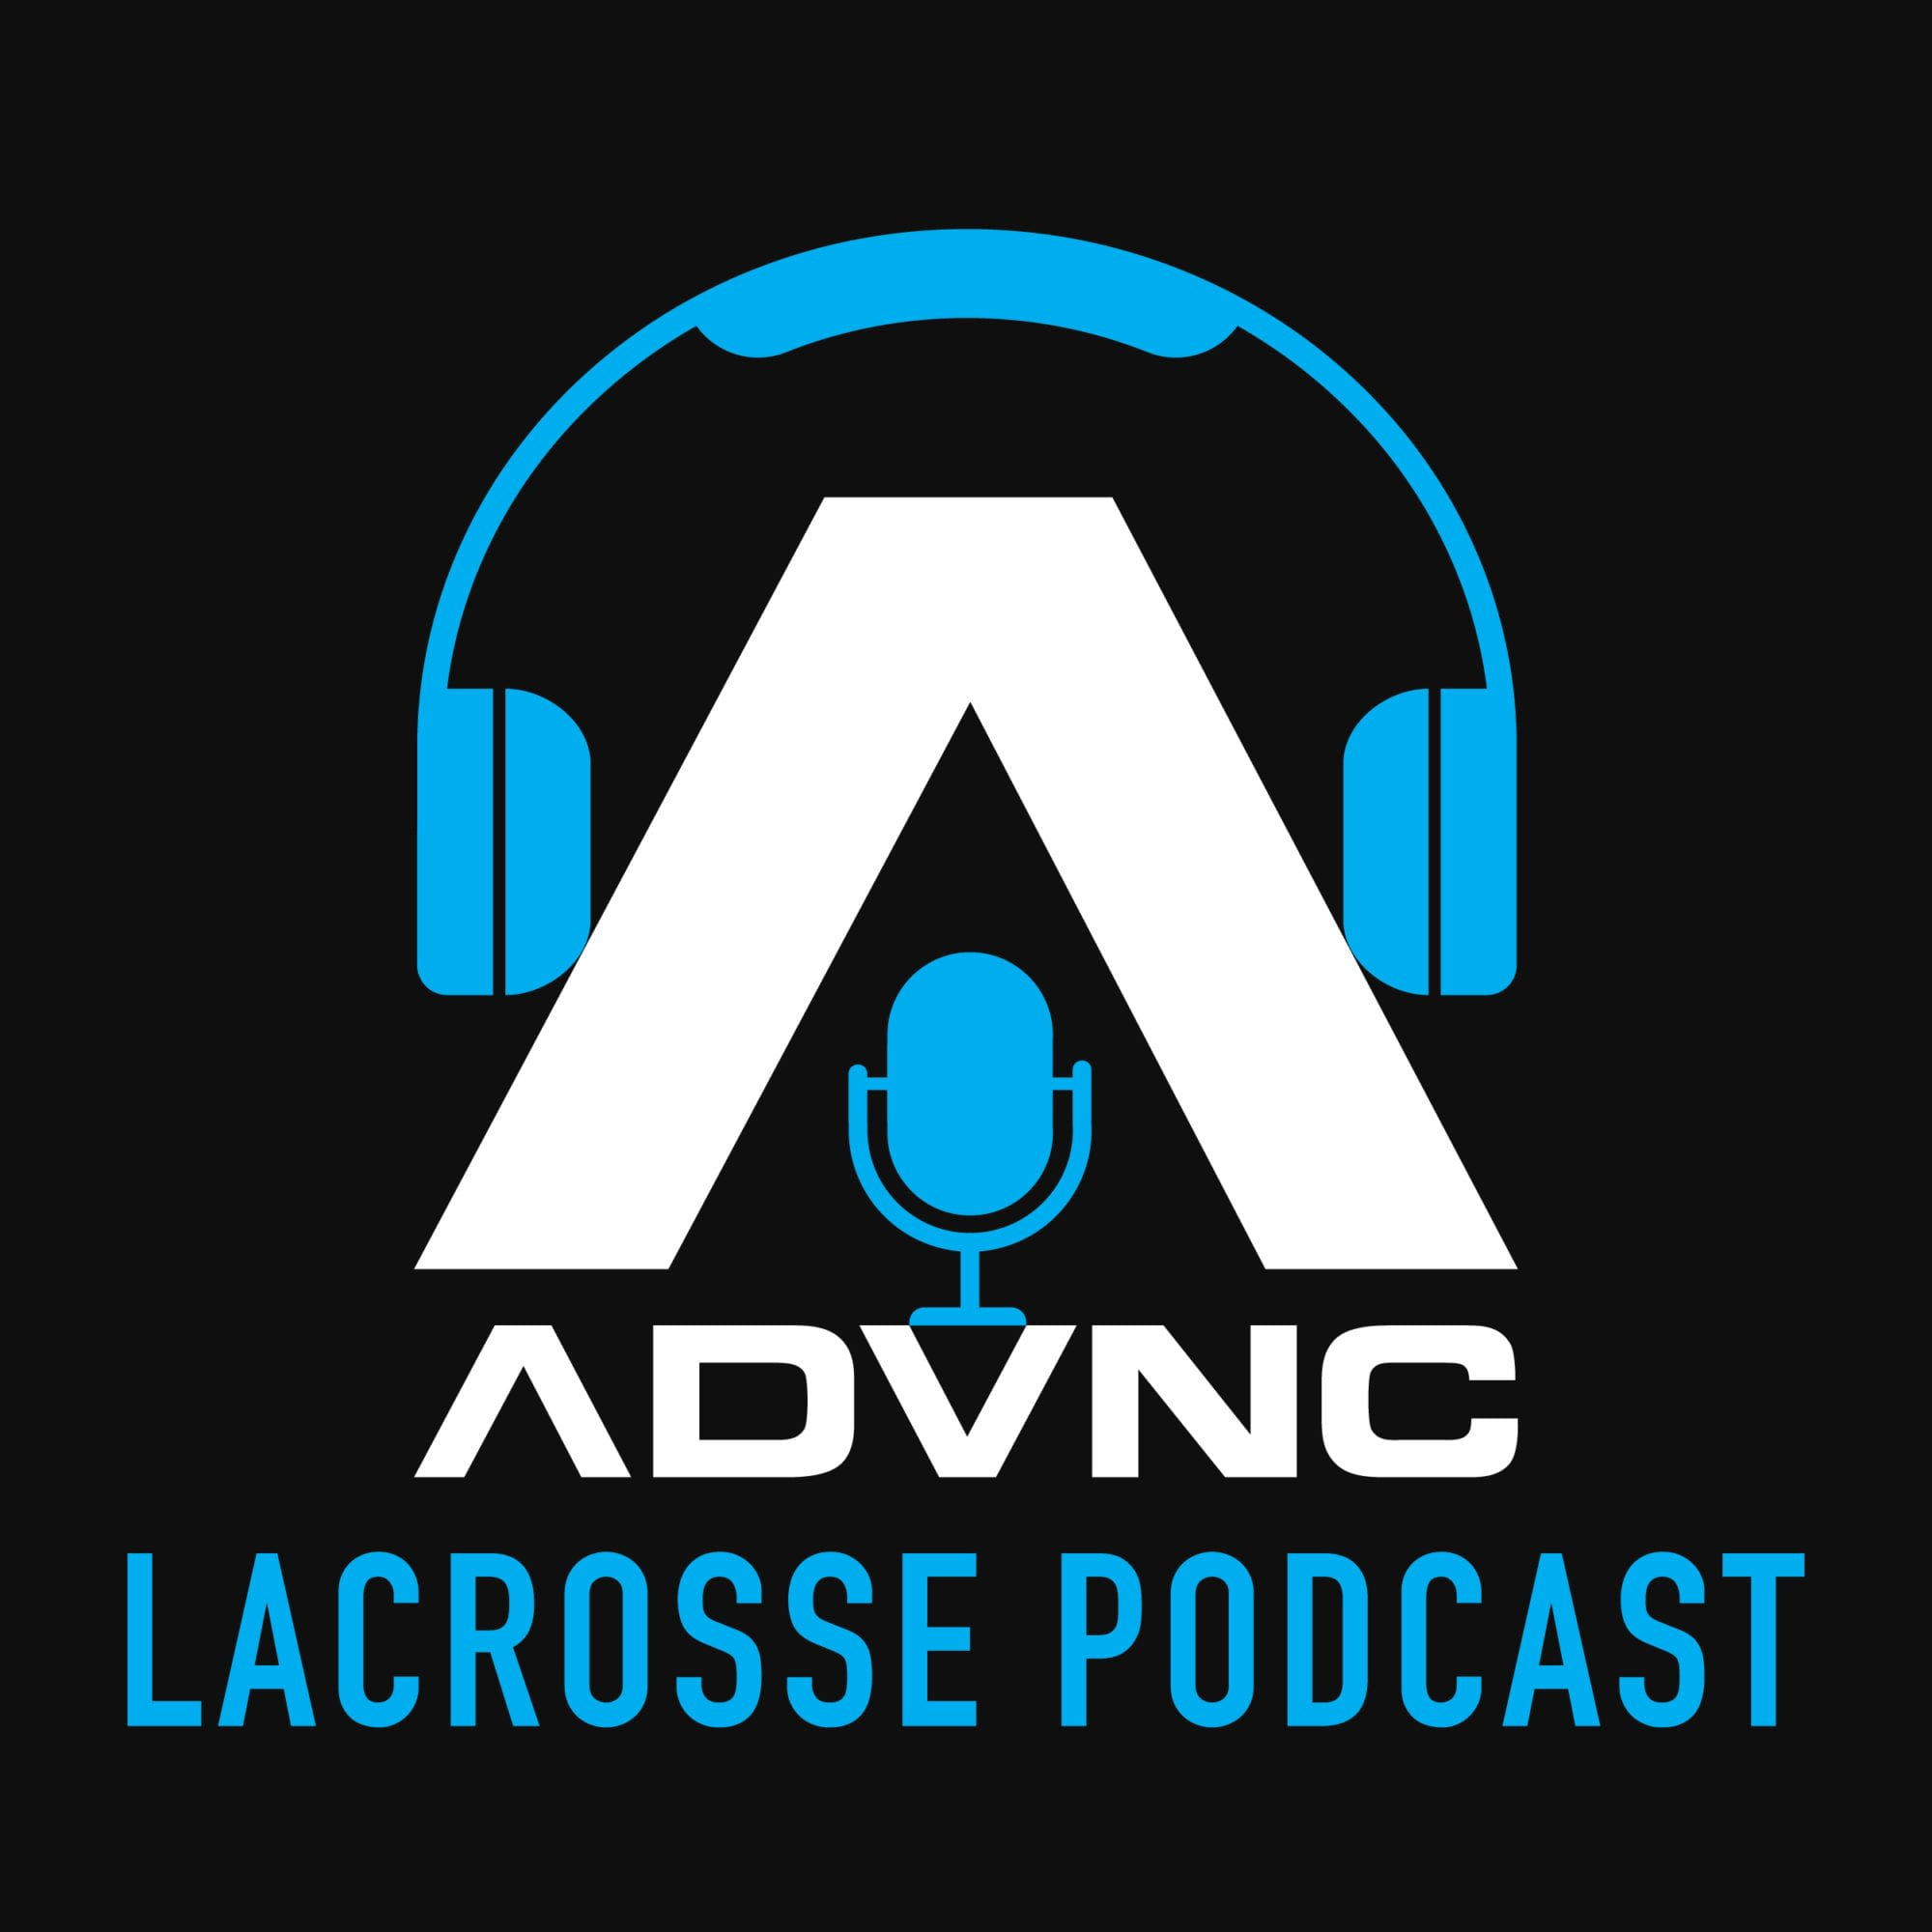 ryan conrad advnc lacrosse podcast